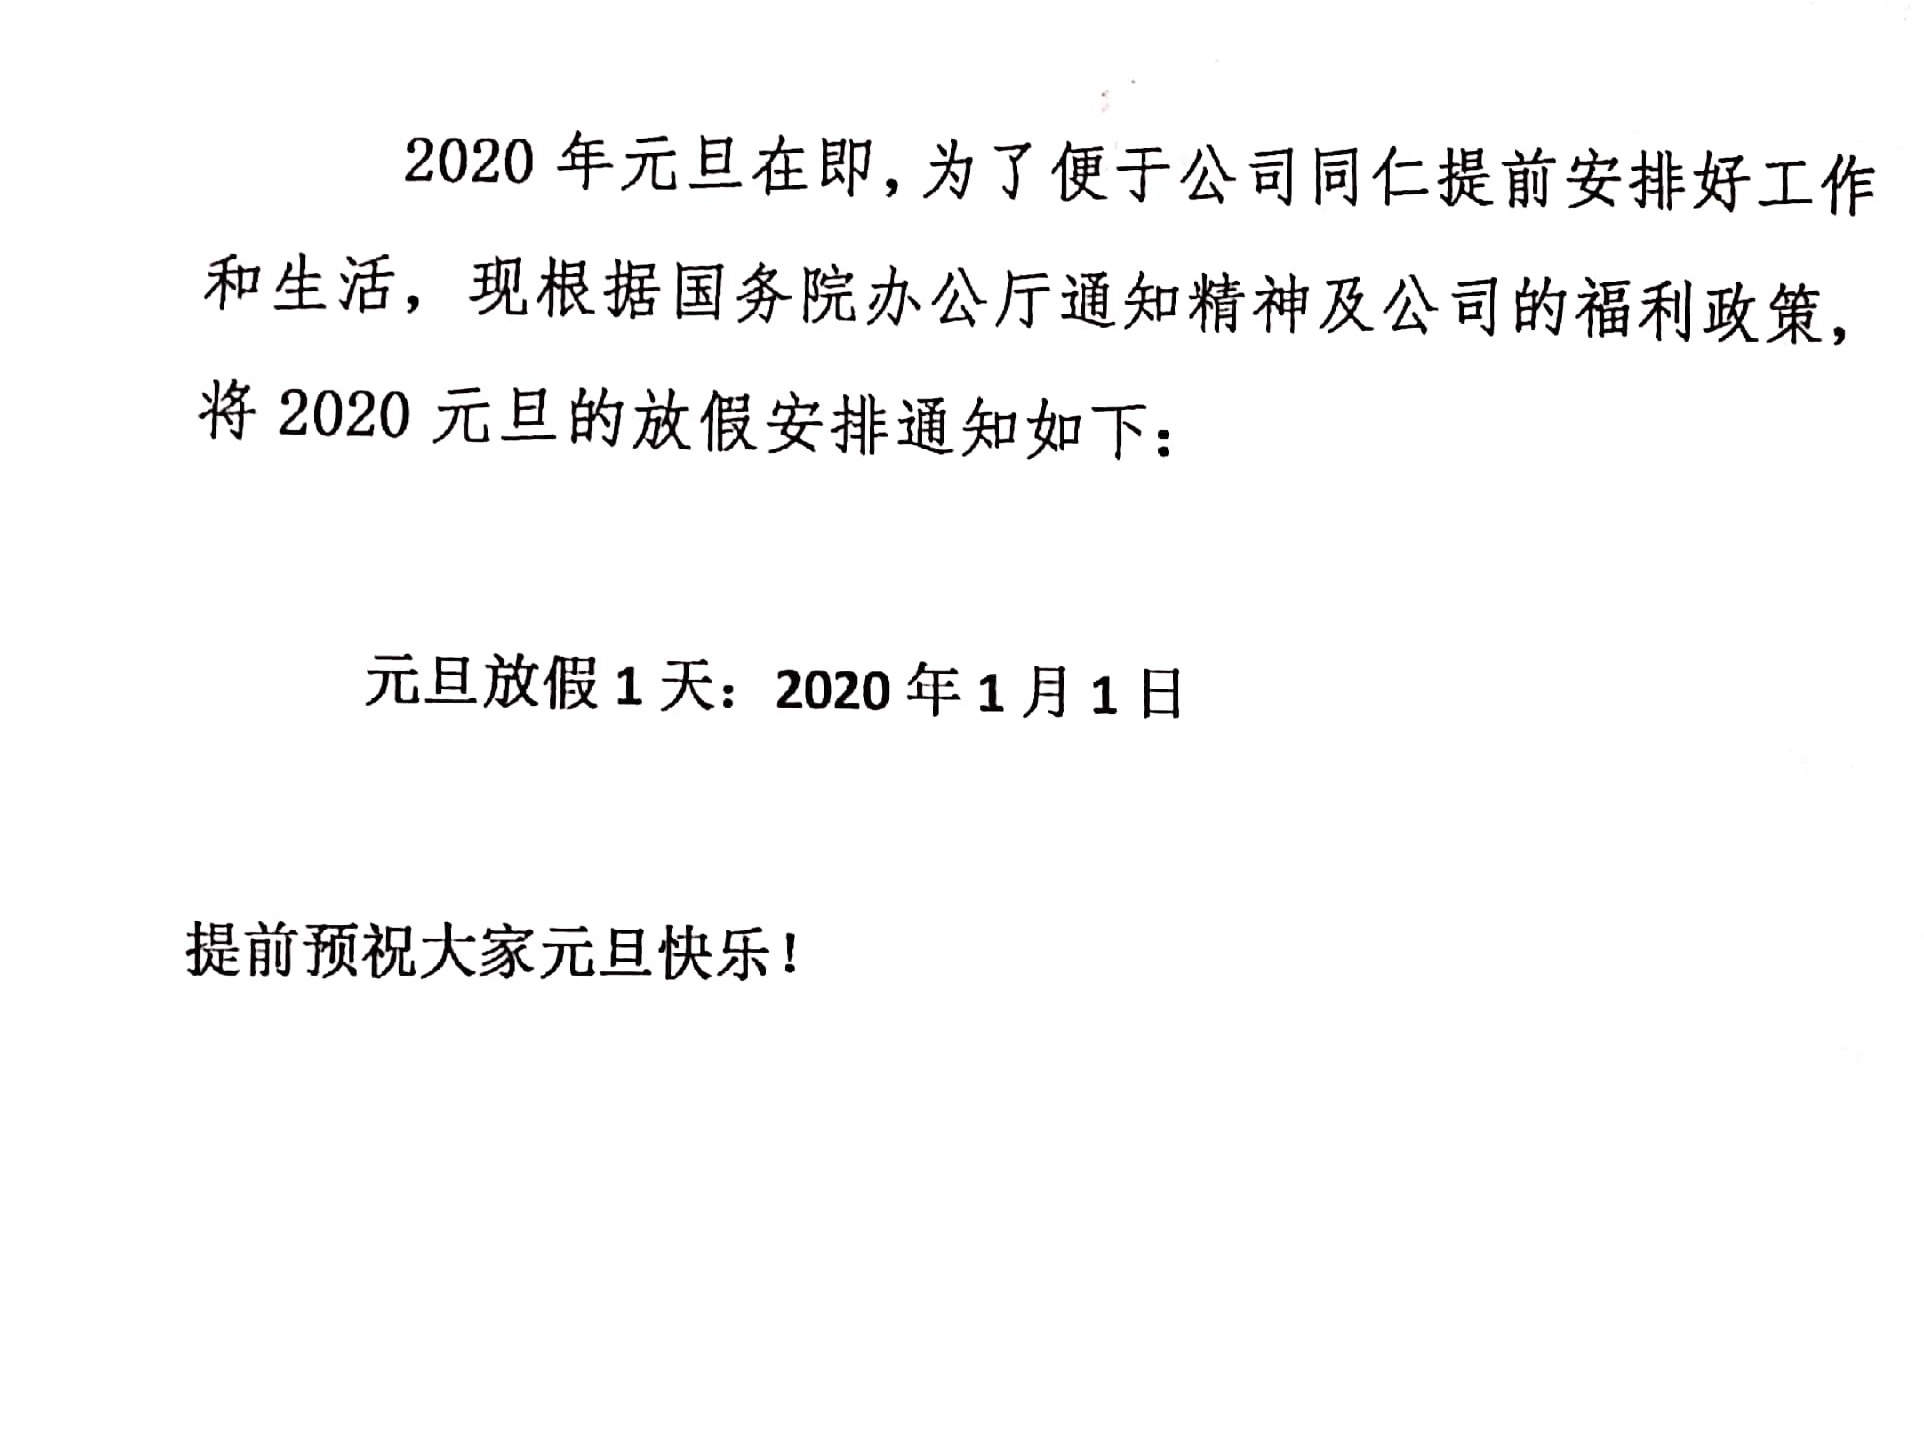 YIPI New Year's Day Holiday Notice 2020